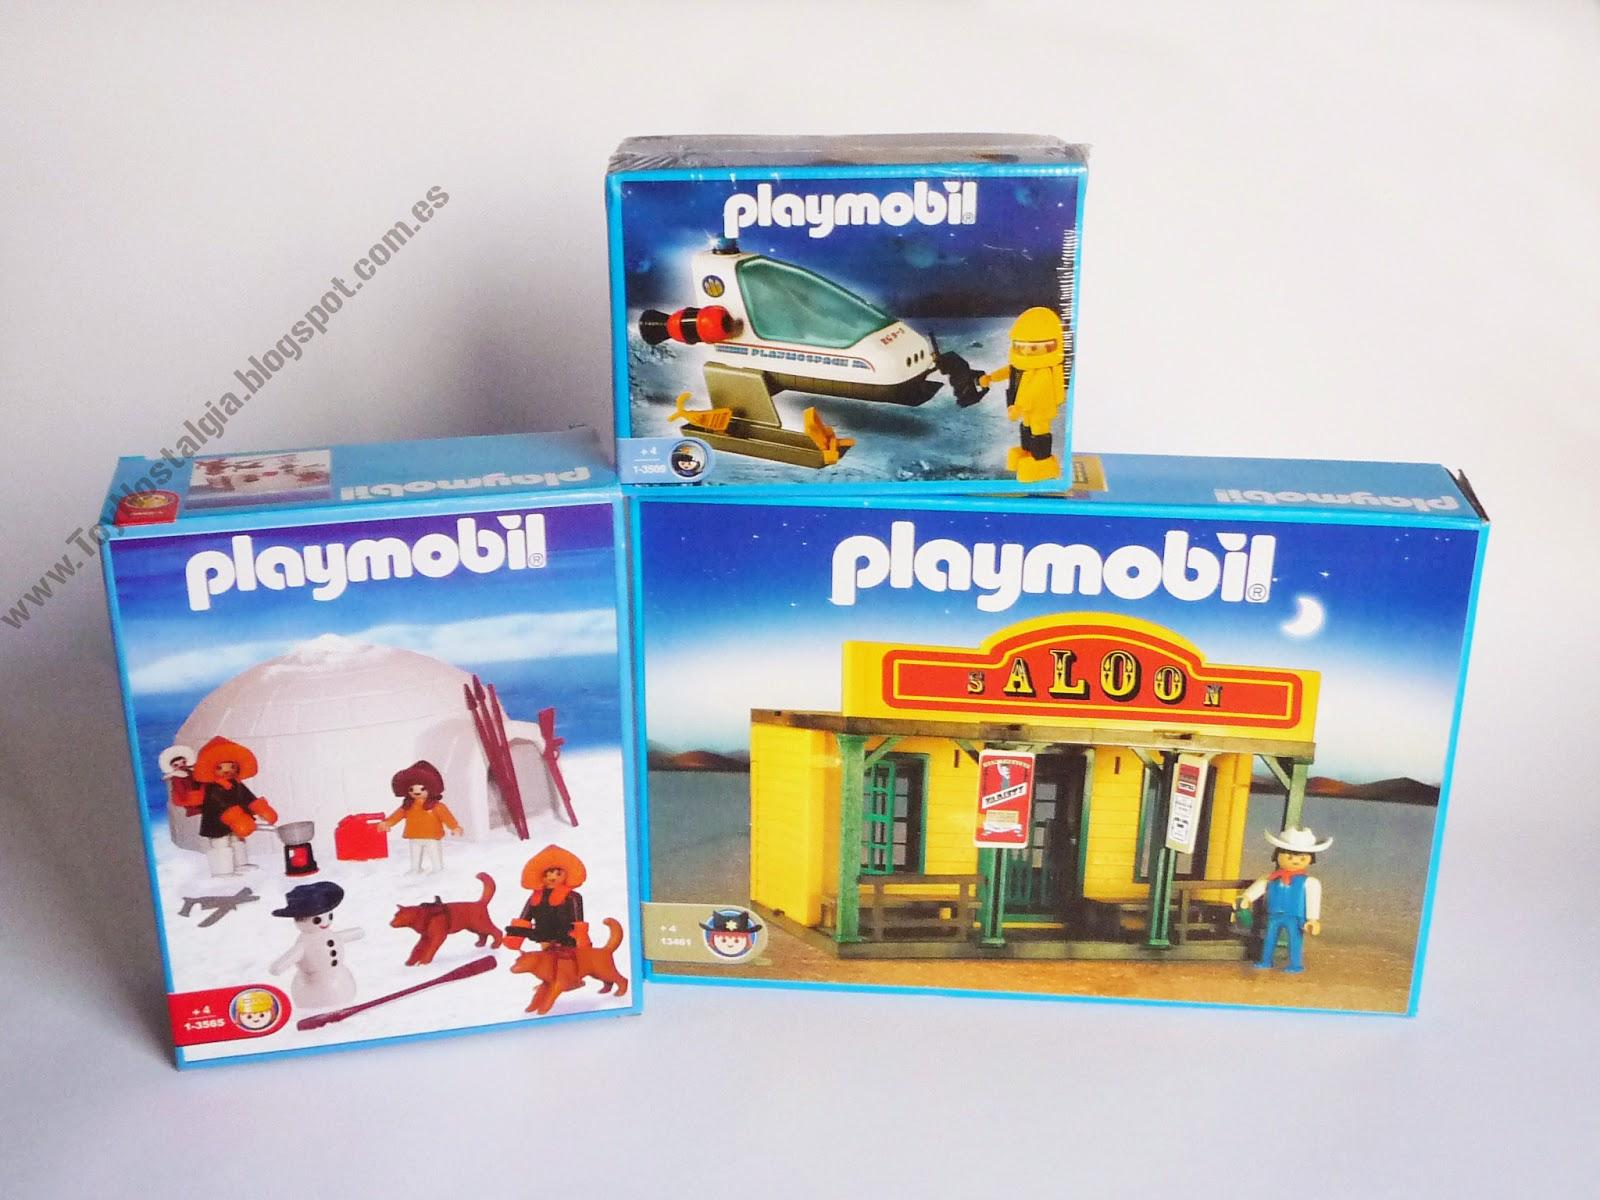 Cajas Antex © Playmobil Geobra Brandstätter